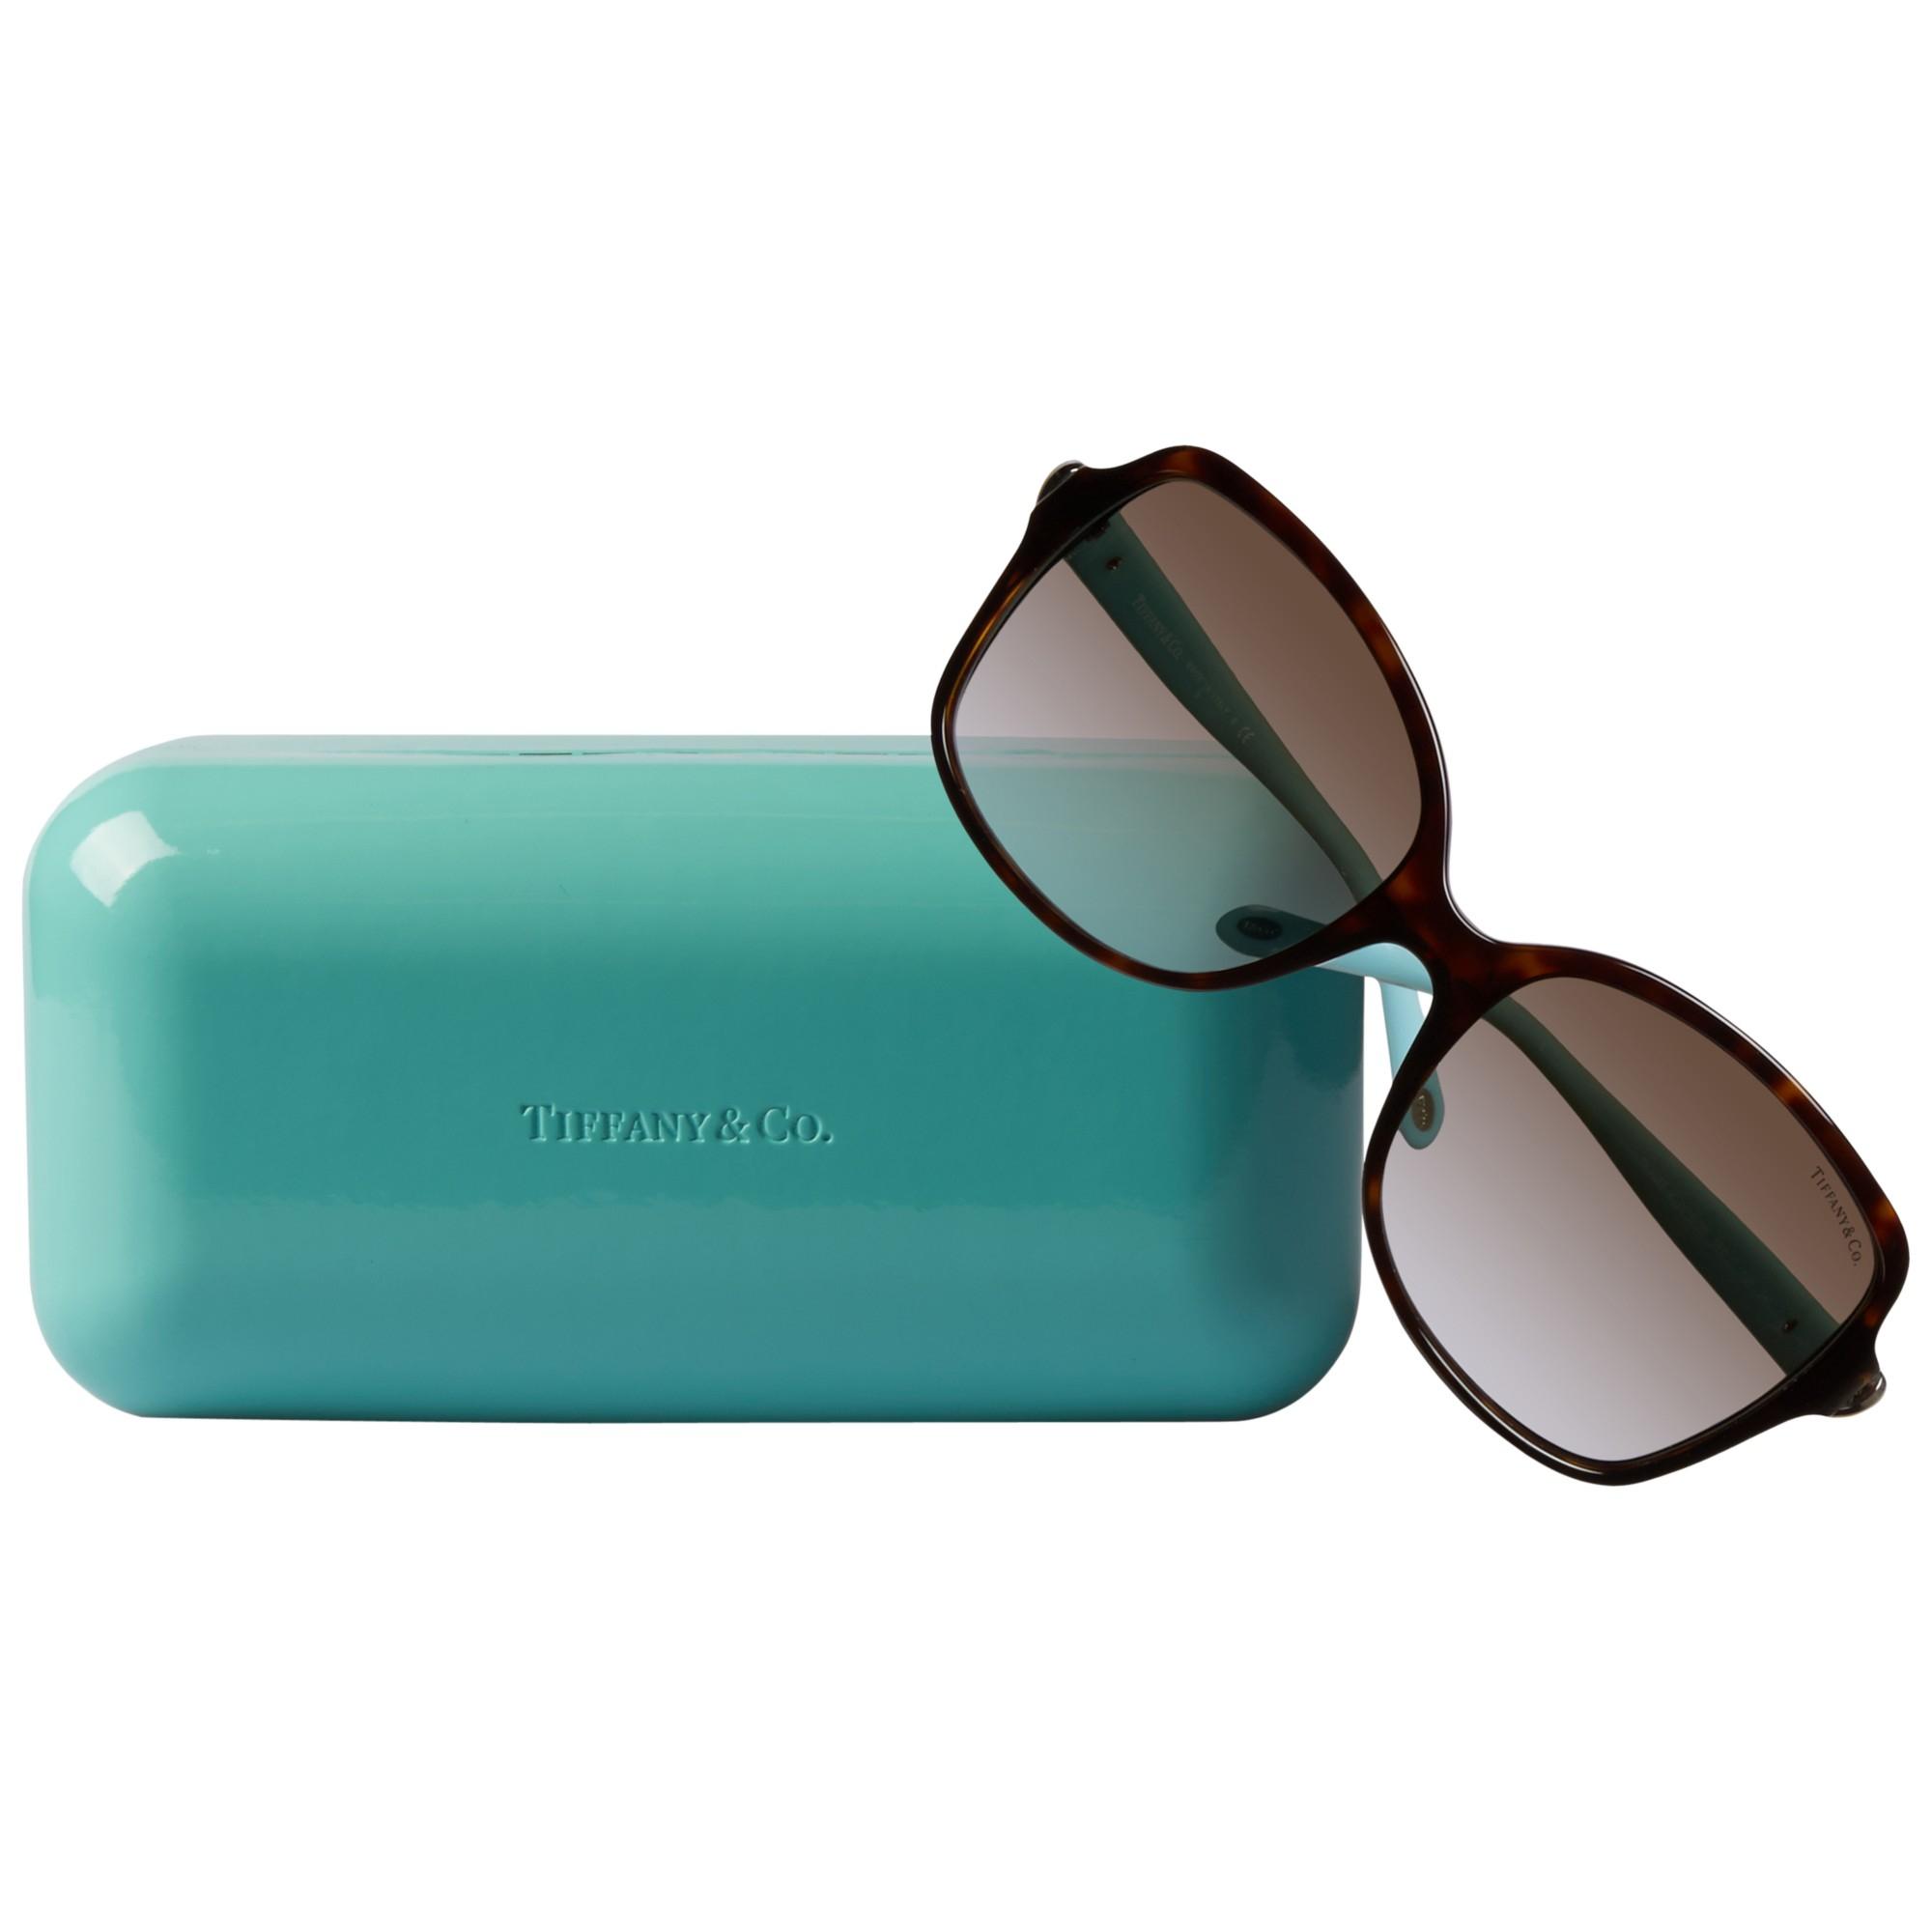 Tiffany & Co. Tf4085H Rectangular Sunglasses in Brown